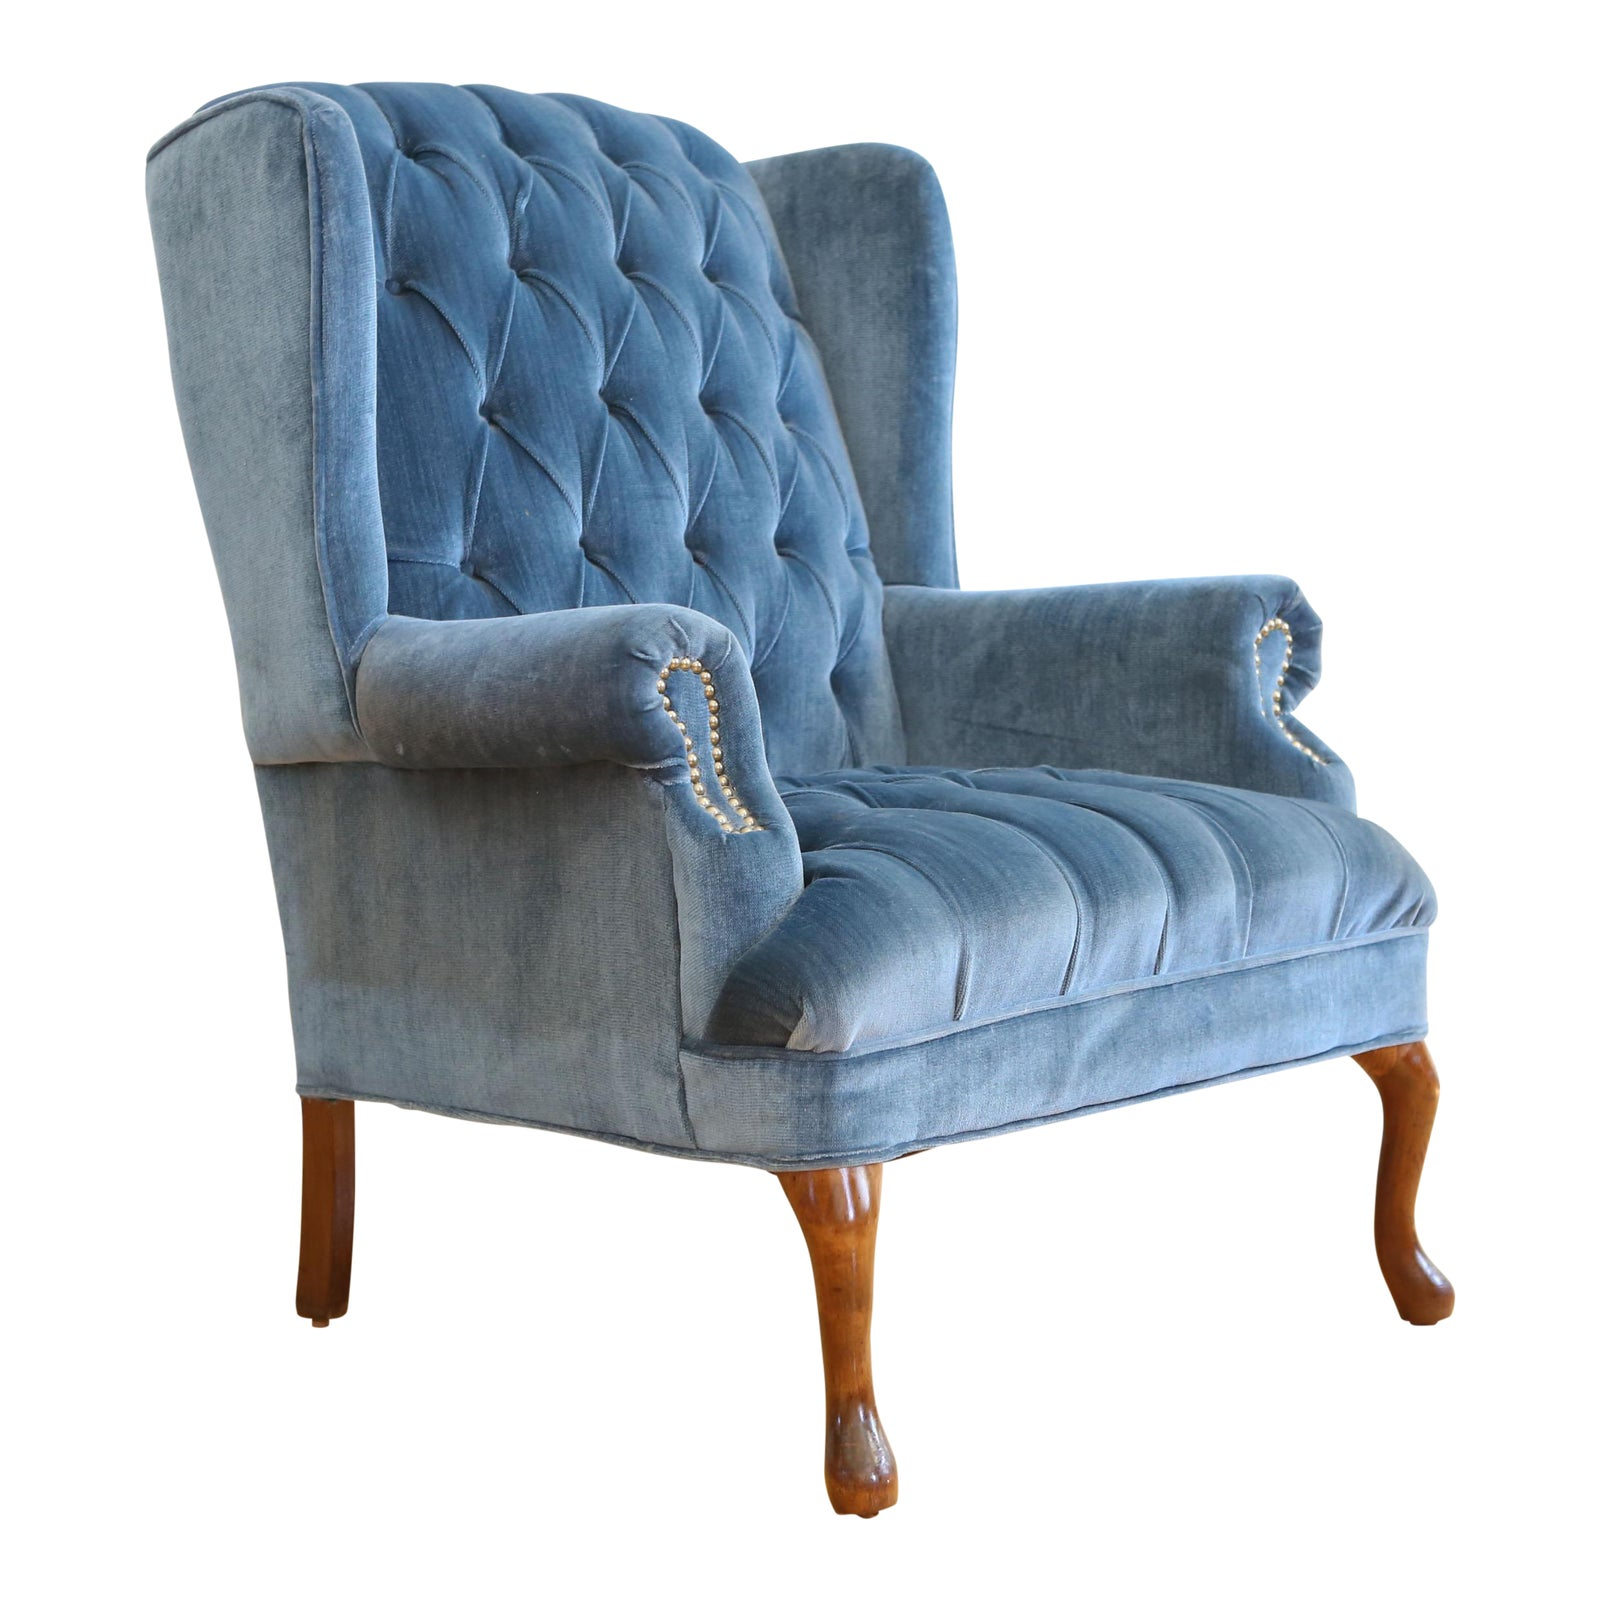 Vintage Blue Navy Tufted Velvet Wingback Chair | Chairish